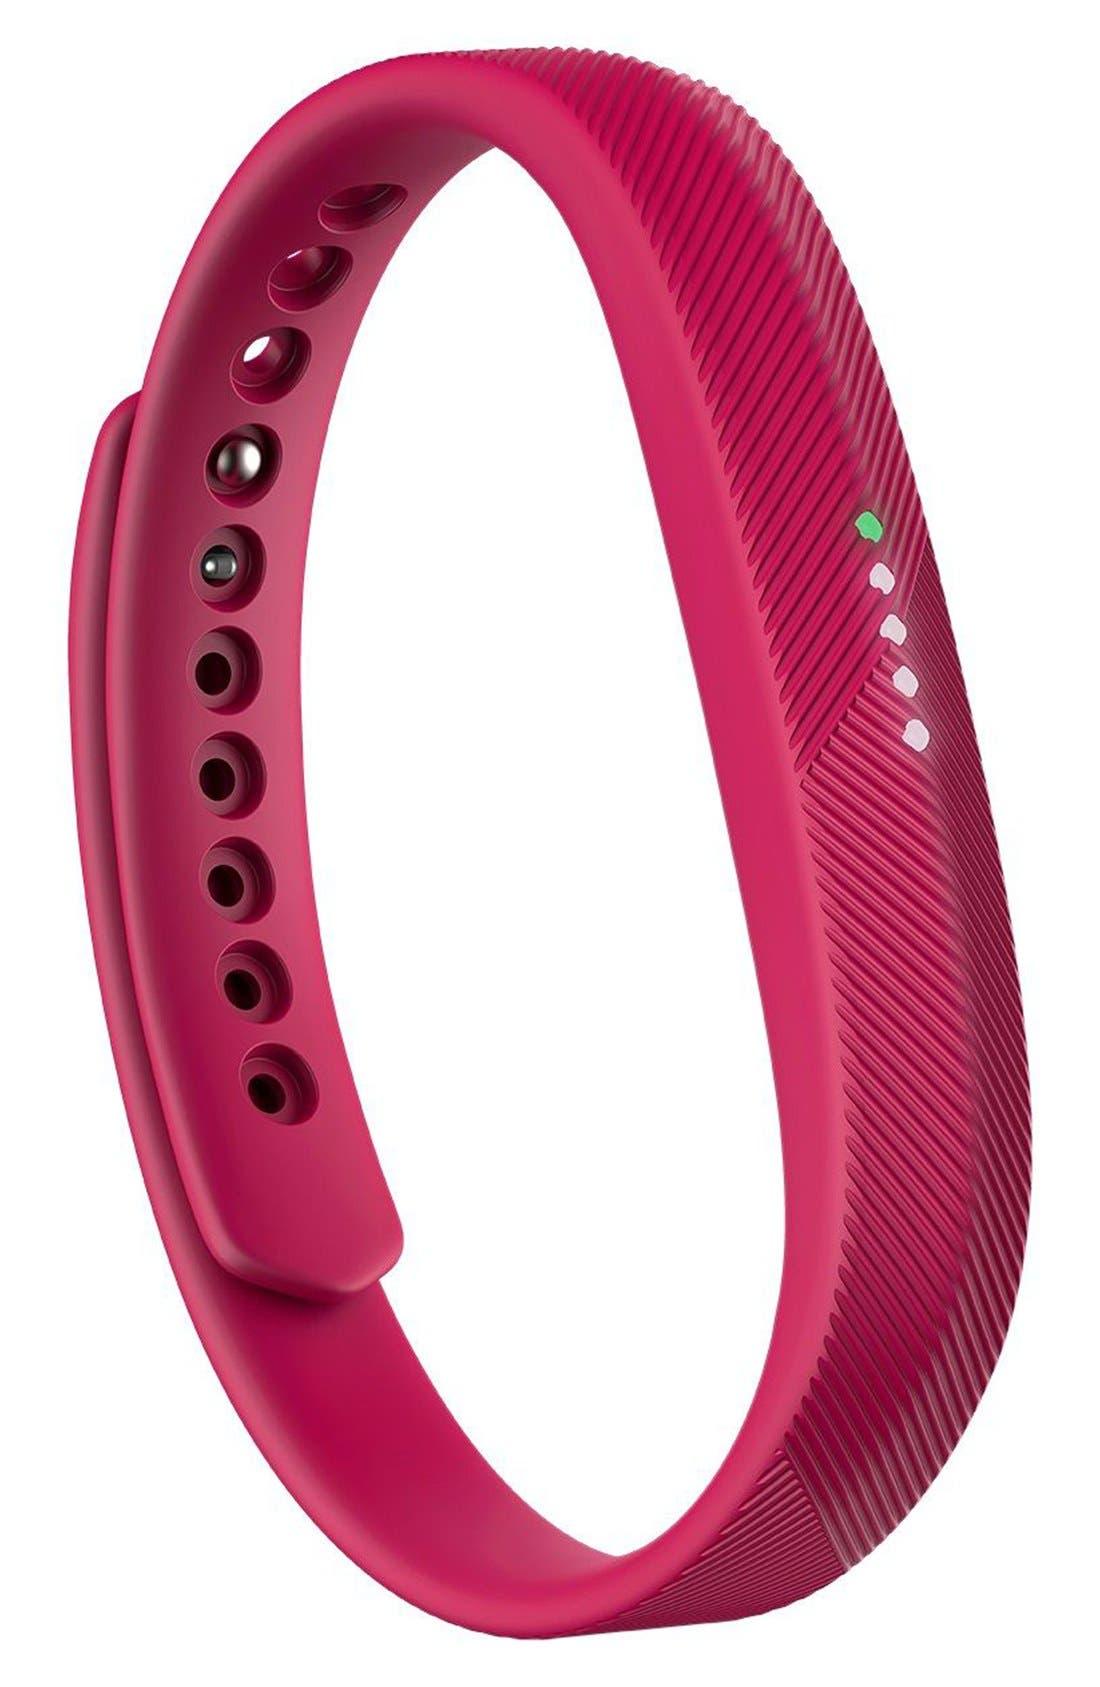 FITBIT 'Flex 2' Wireless Activity & Sleep Wristband in Pink